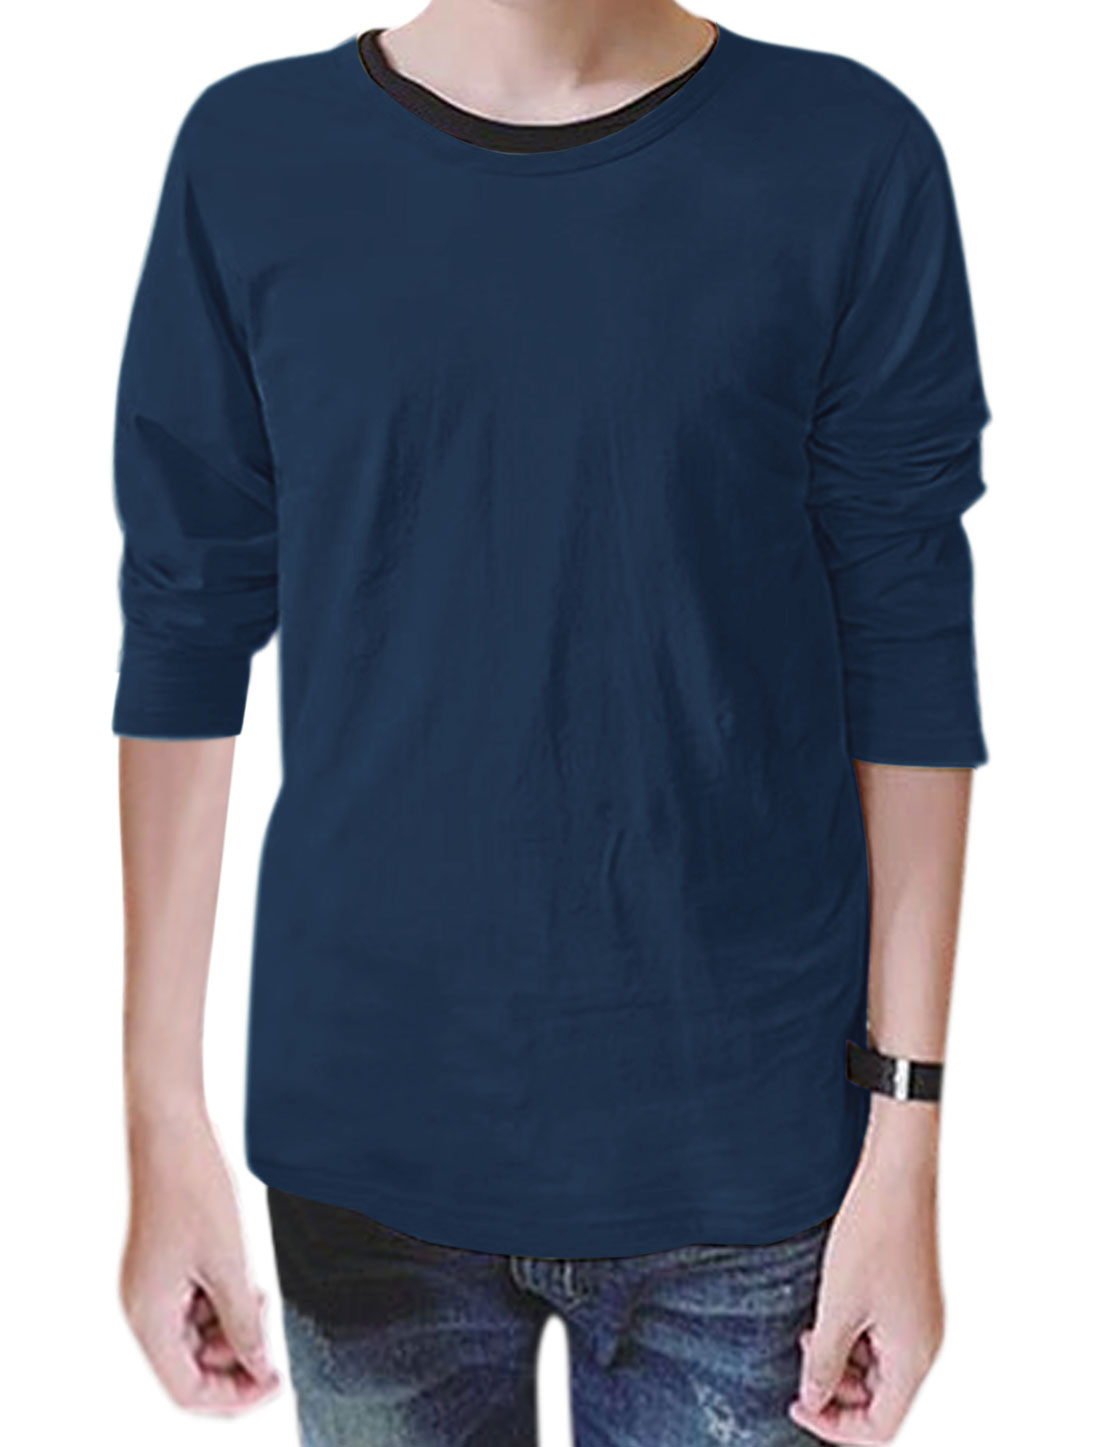 Men Round Neck Long Sleeves Slim Fit T-Shirt Navy Blue M